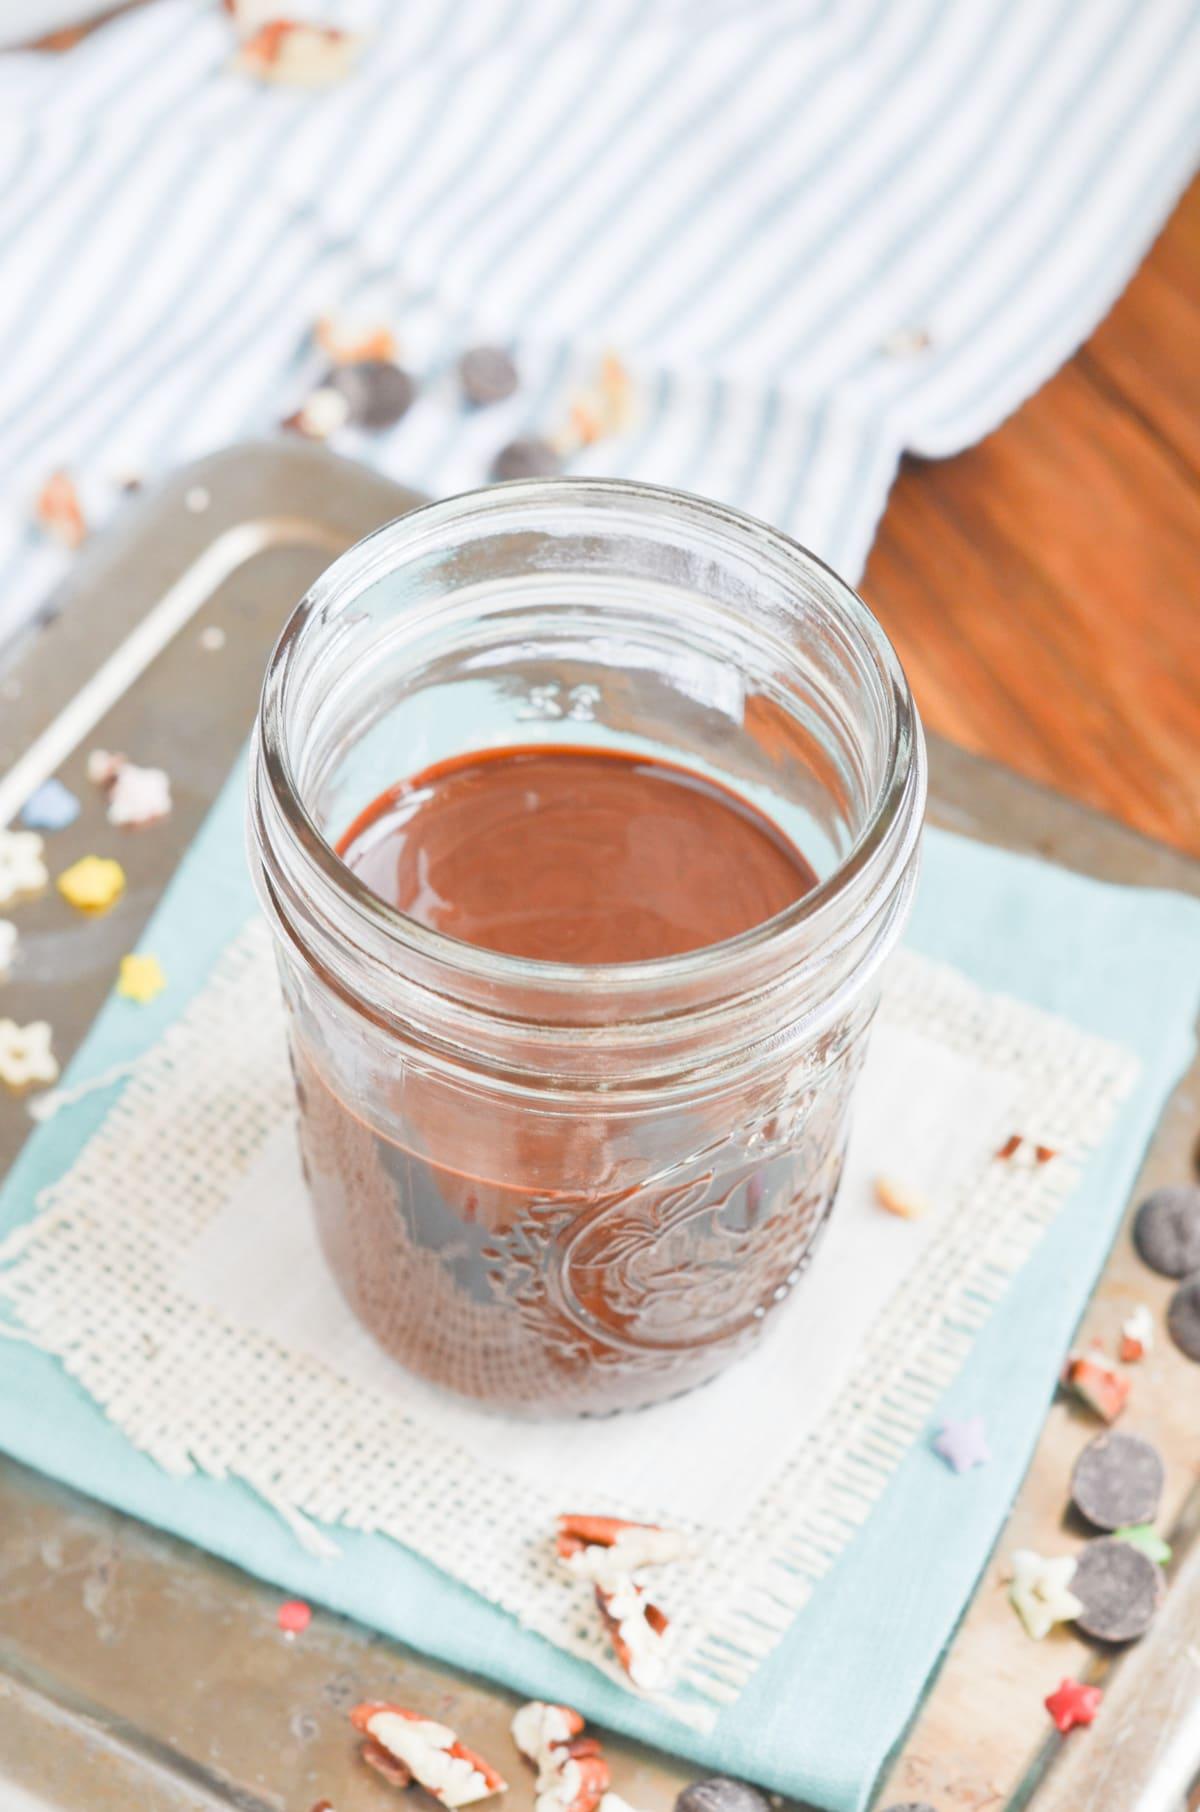 chocolate shell in glass jar.